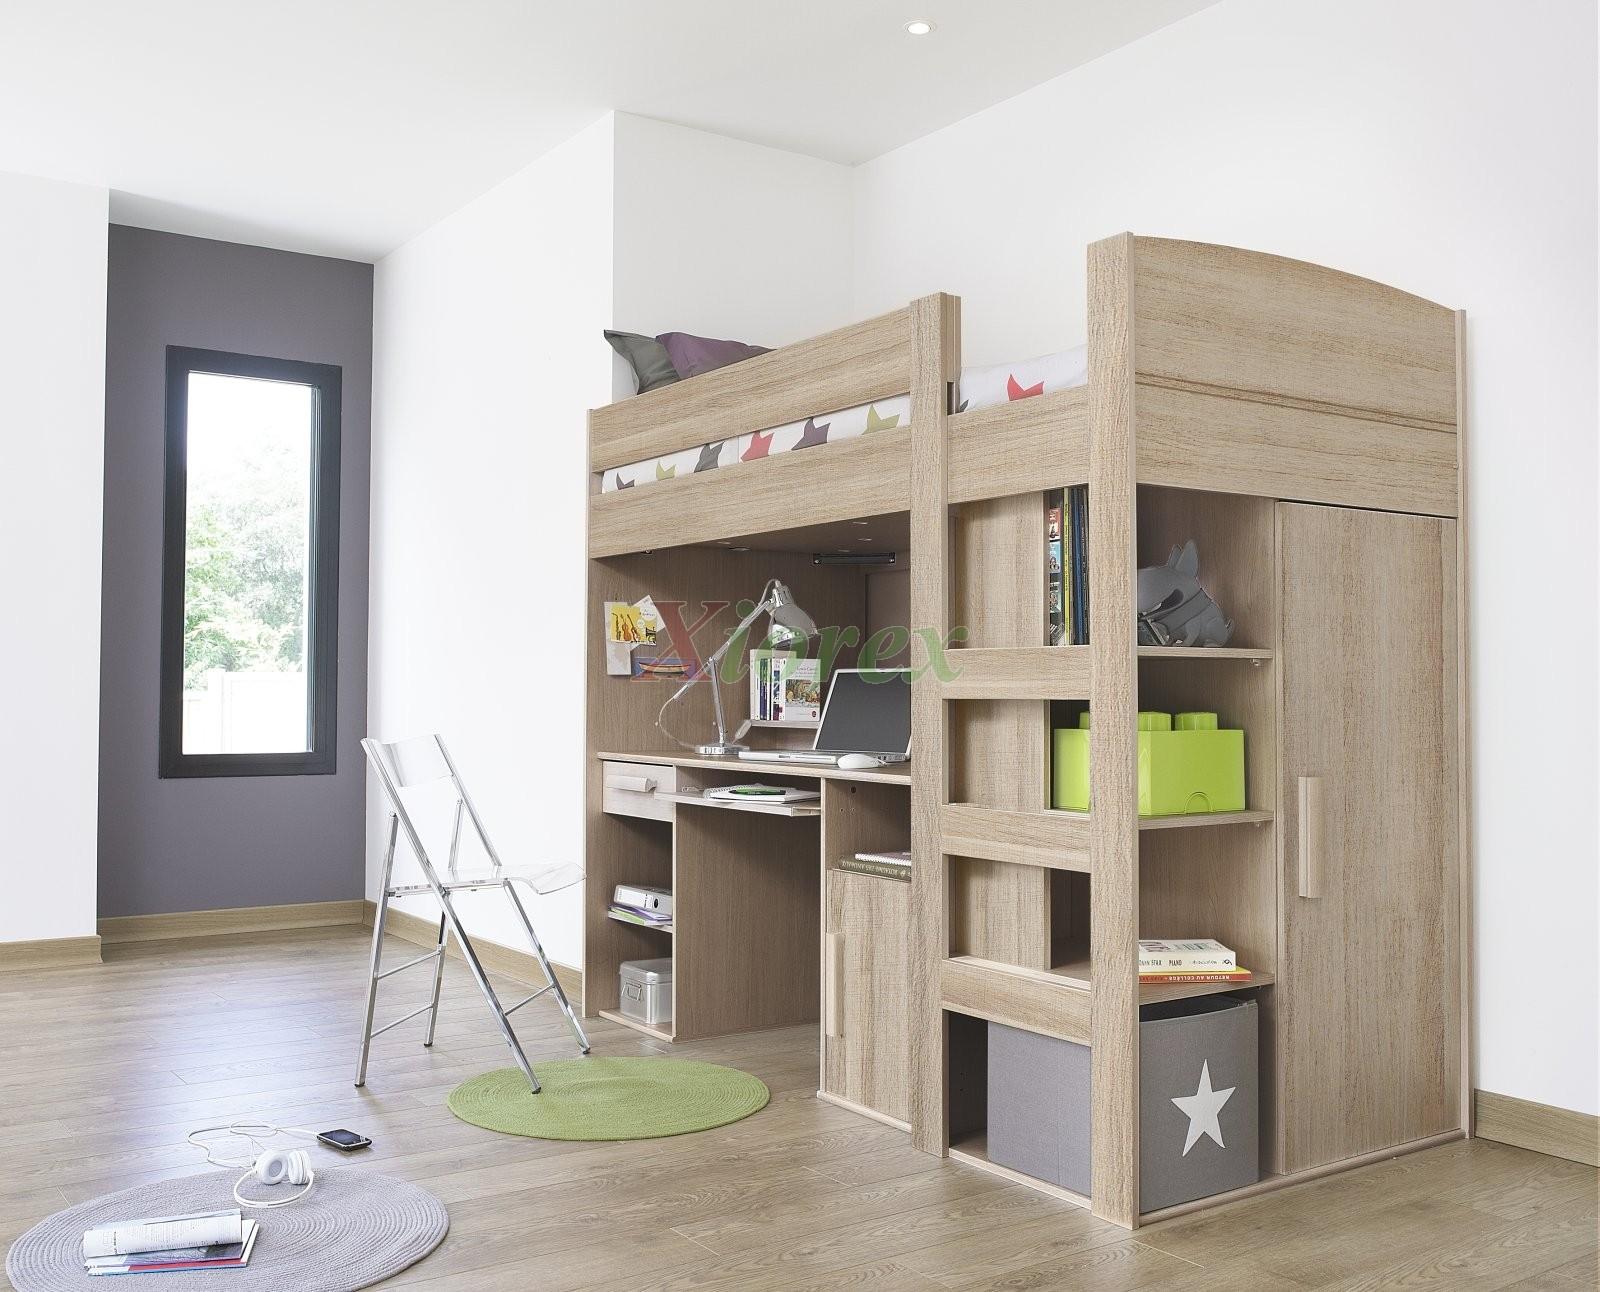 Gami Montana Loft Beds with Desk Closet & Storage